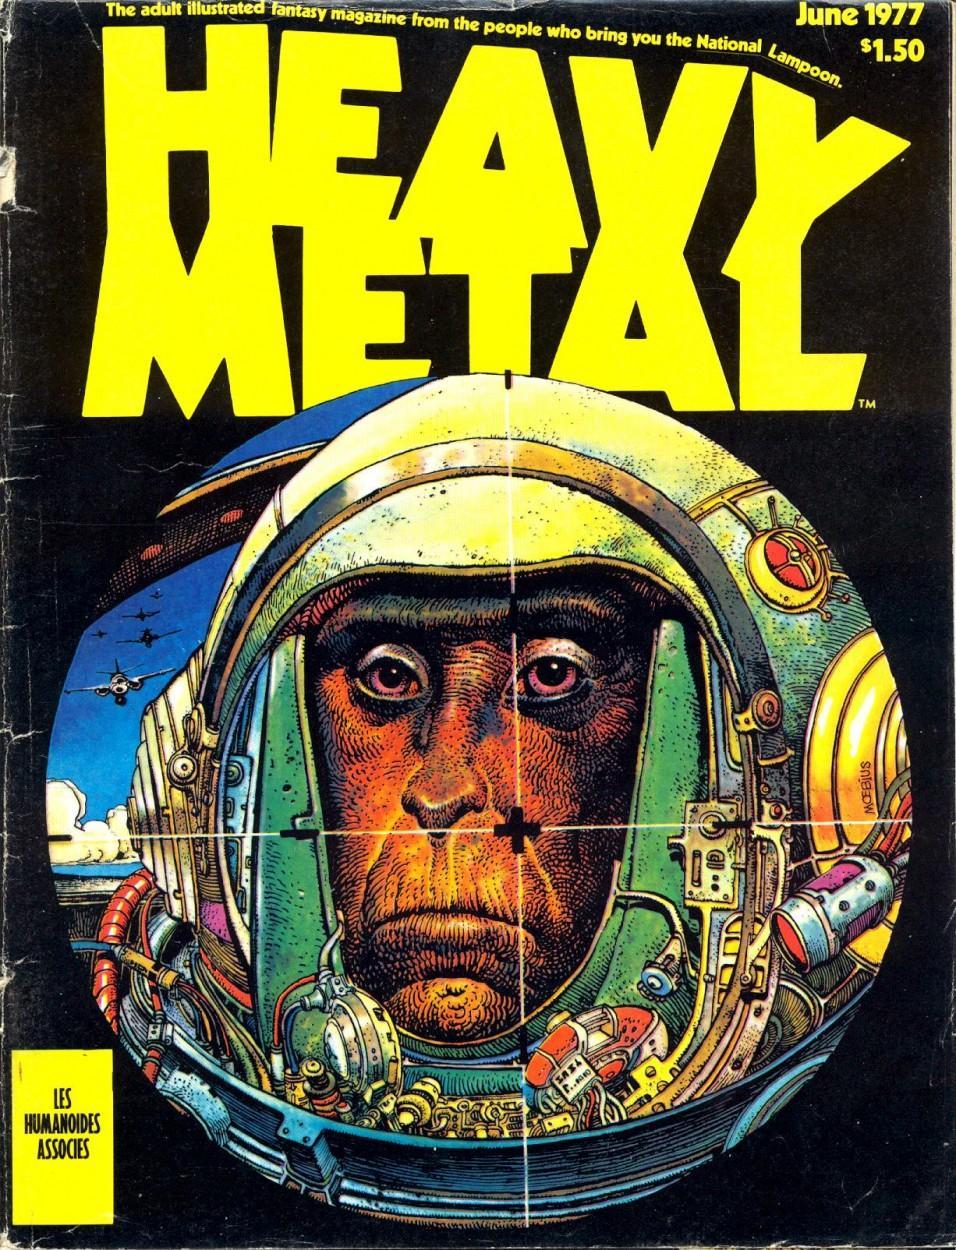 Heavy Metal Magazine 1977 sept NIGHT GRASS, MAJOR FATAL, TEONANACATL GENESE